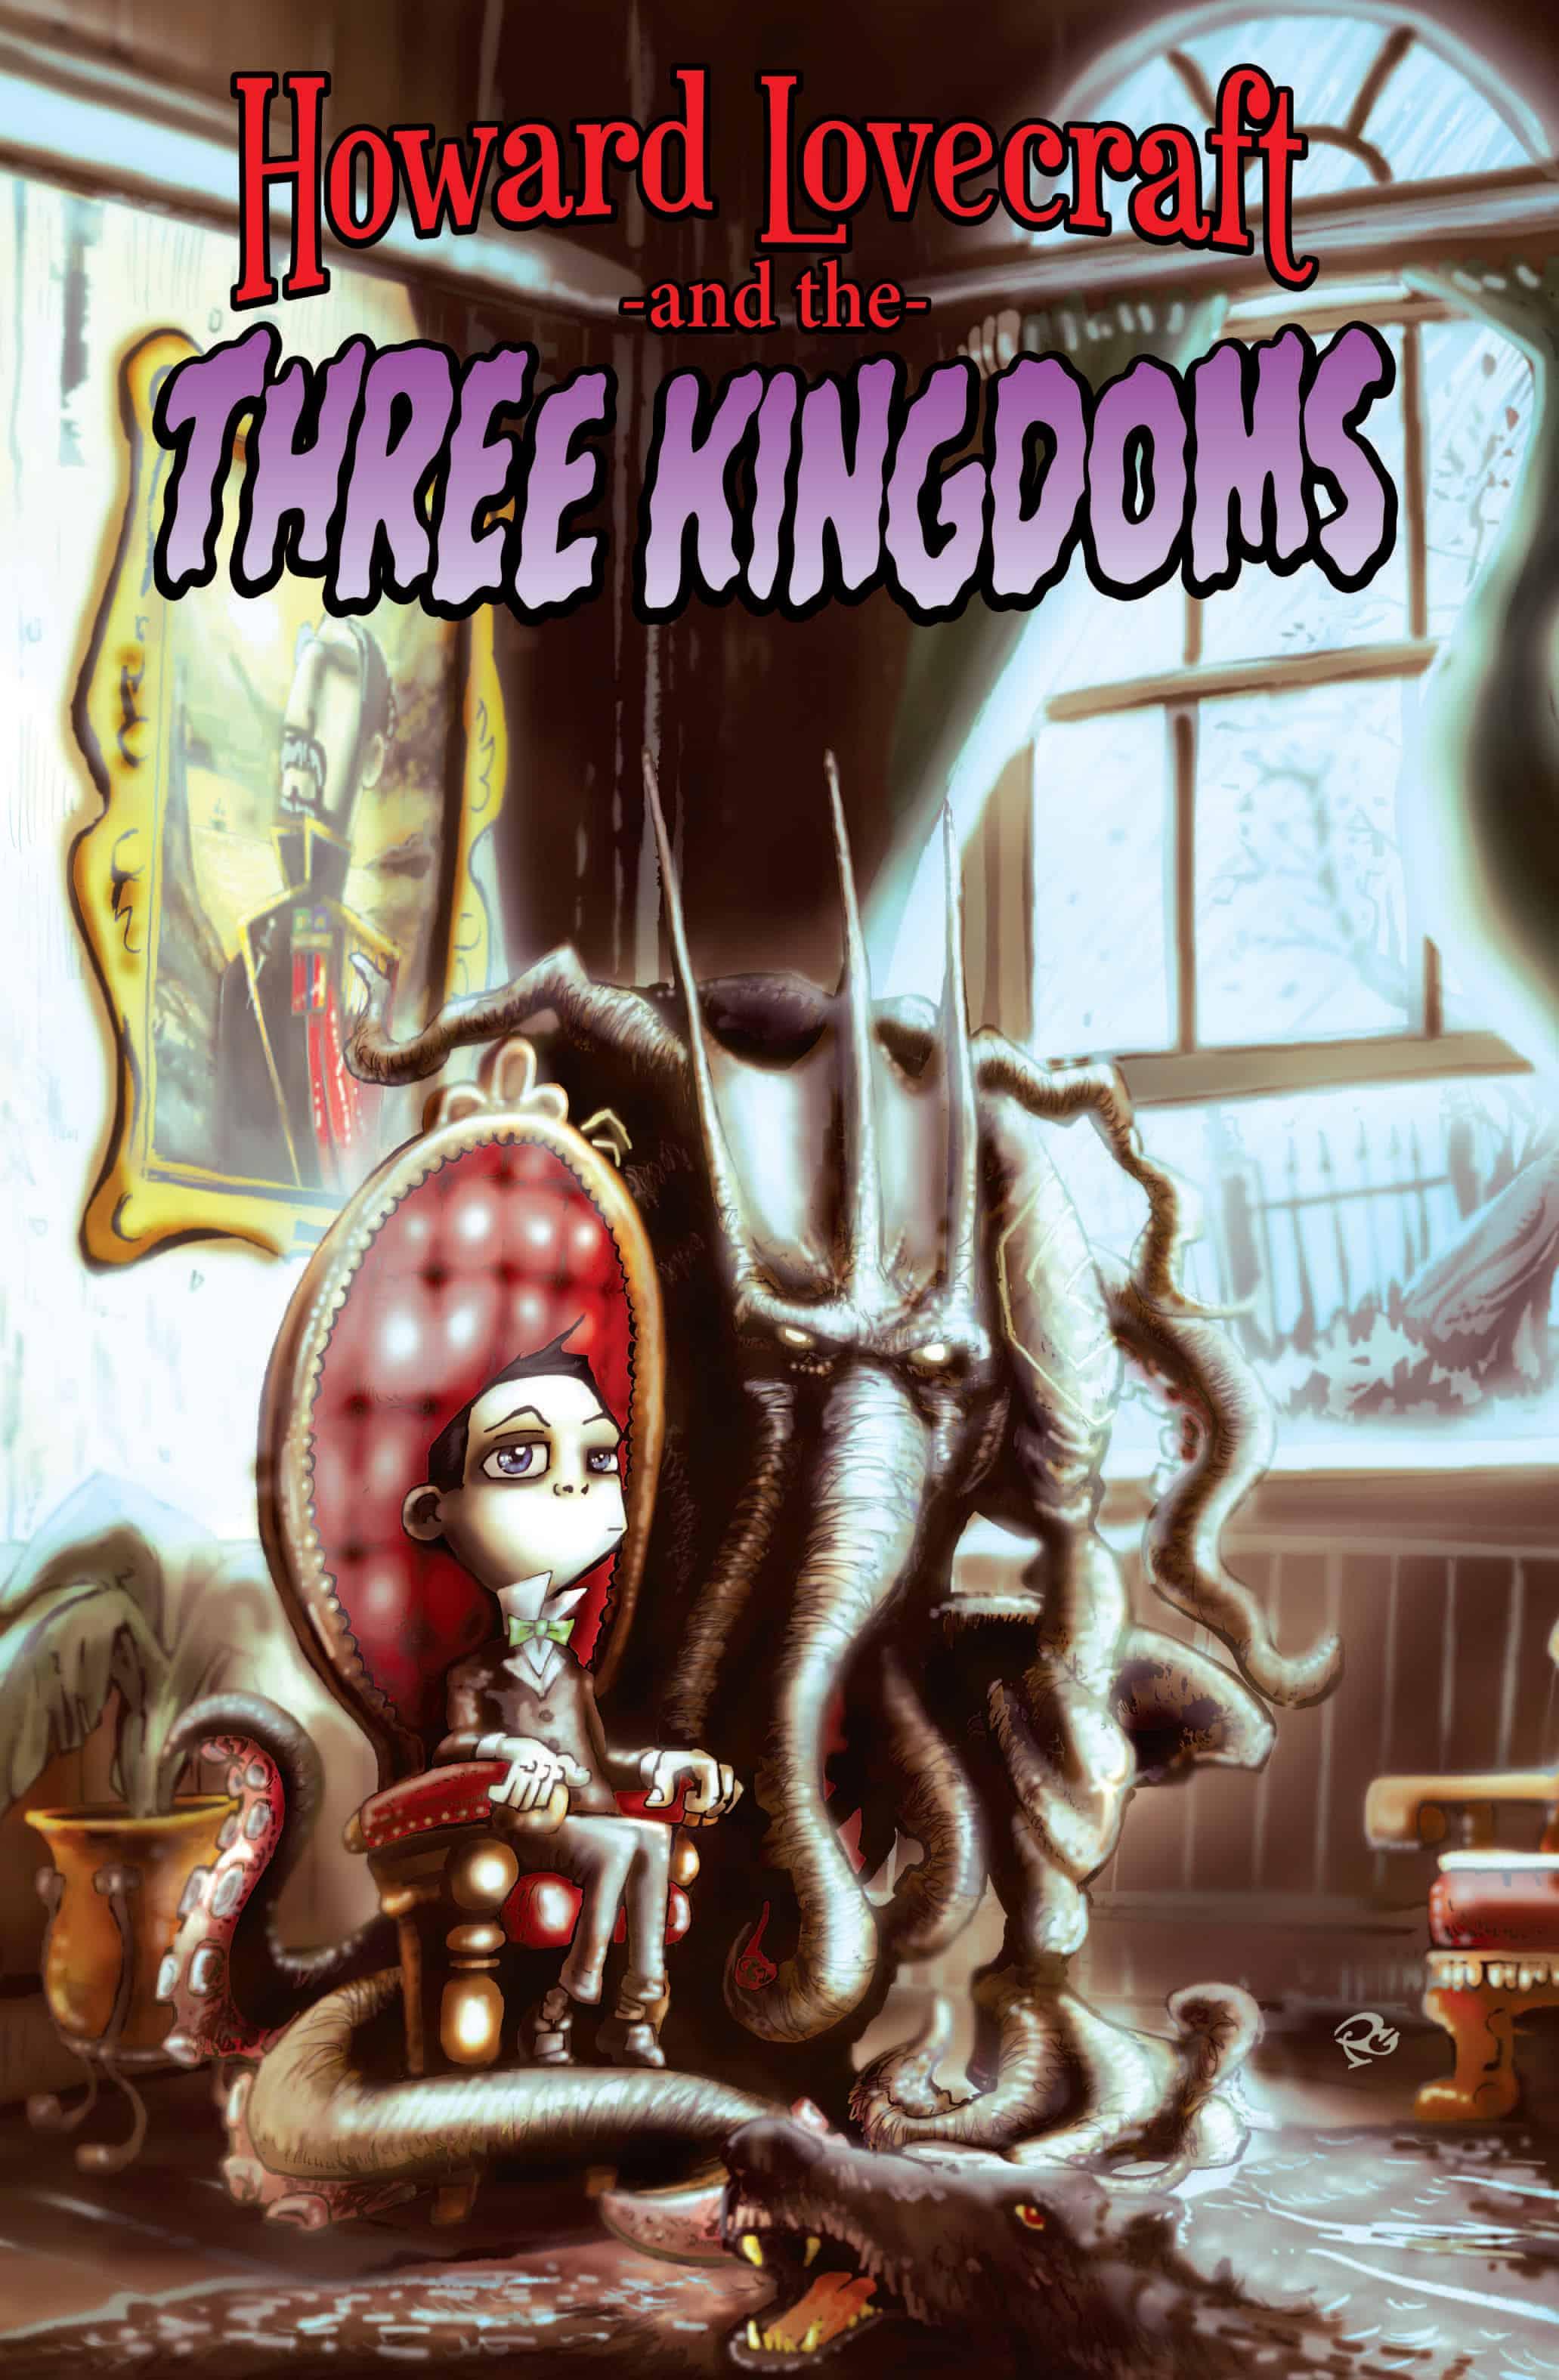 Howard_Lovecraft_Three_Kingdoms-300dpi-1